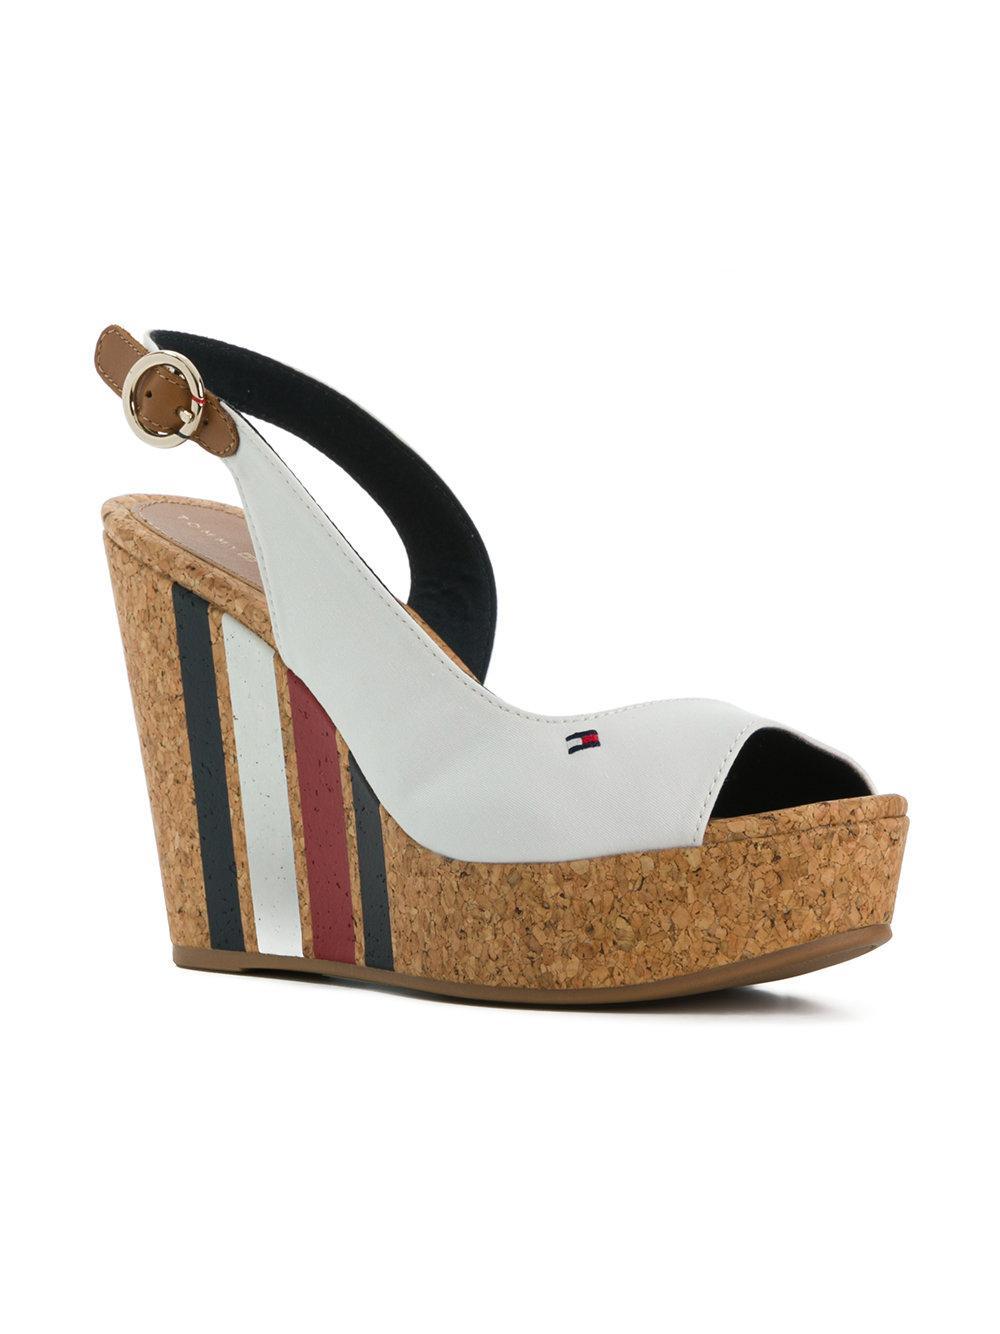 2293640d8 Tommy Hilfiger - White Striped Wedge Heel Sandals - Lyst. View fullscreen